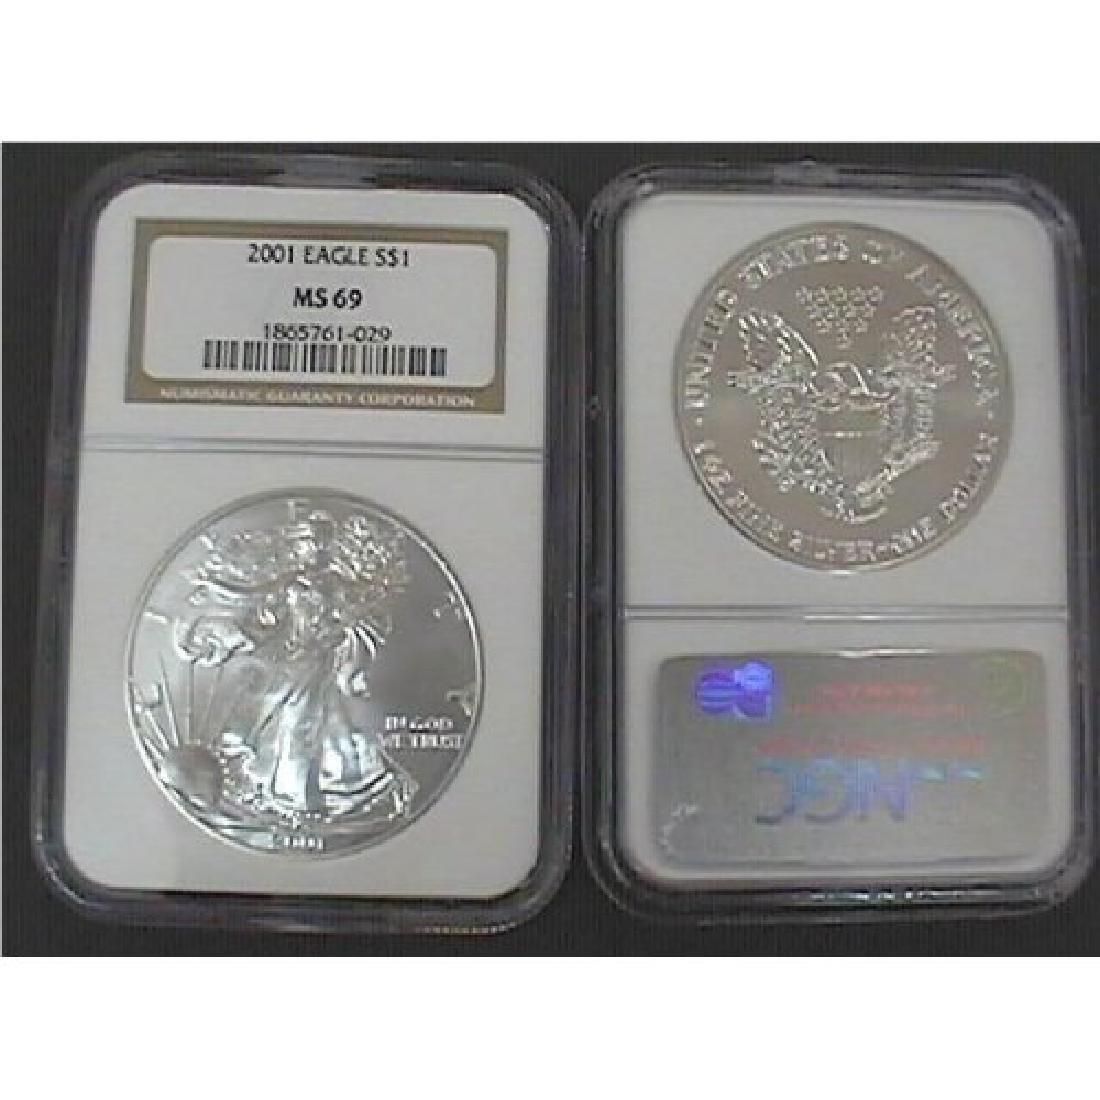 2001 NGC MS-69 American Eagle Silver Dollar